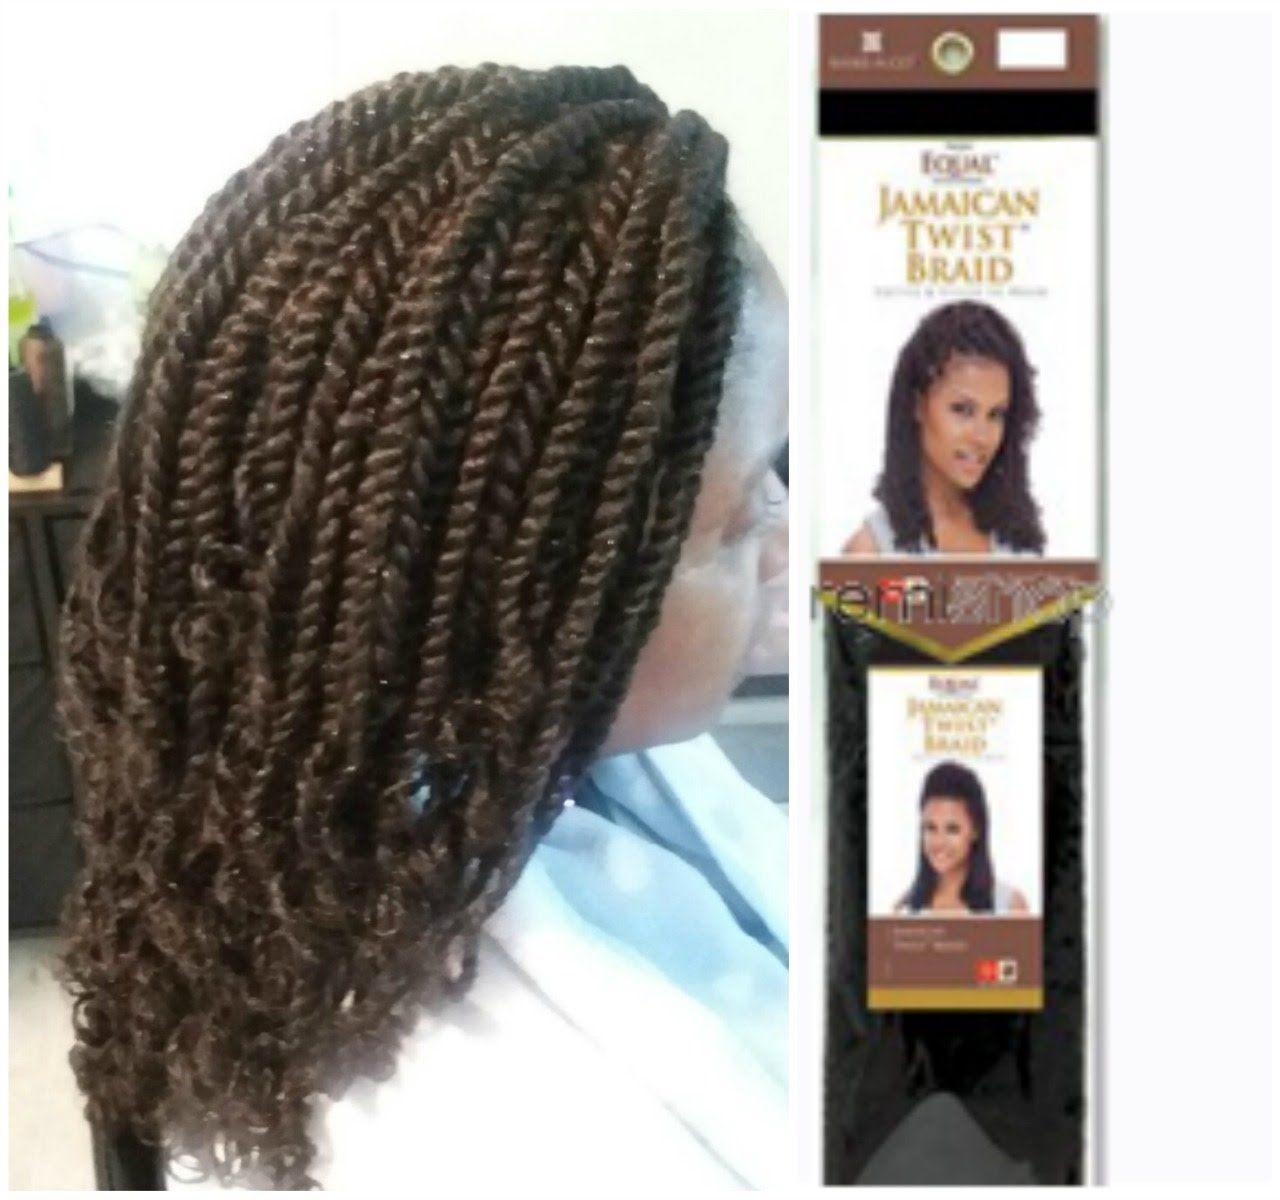 Jamaican Twists Hairstyles For Girls: Freetress Equal Jamaican Twist Braid